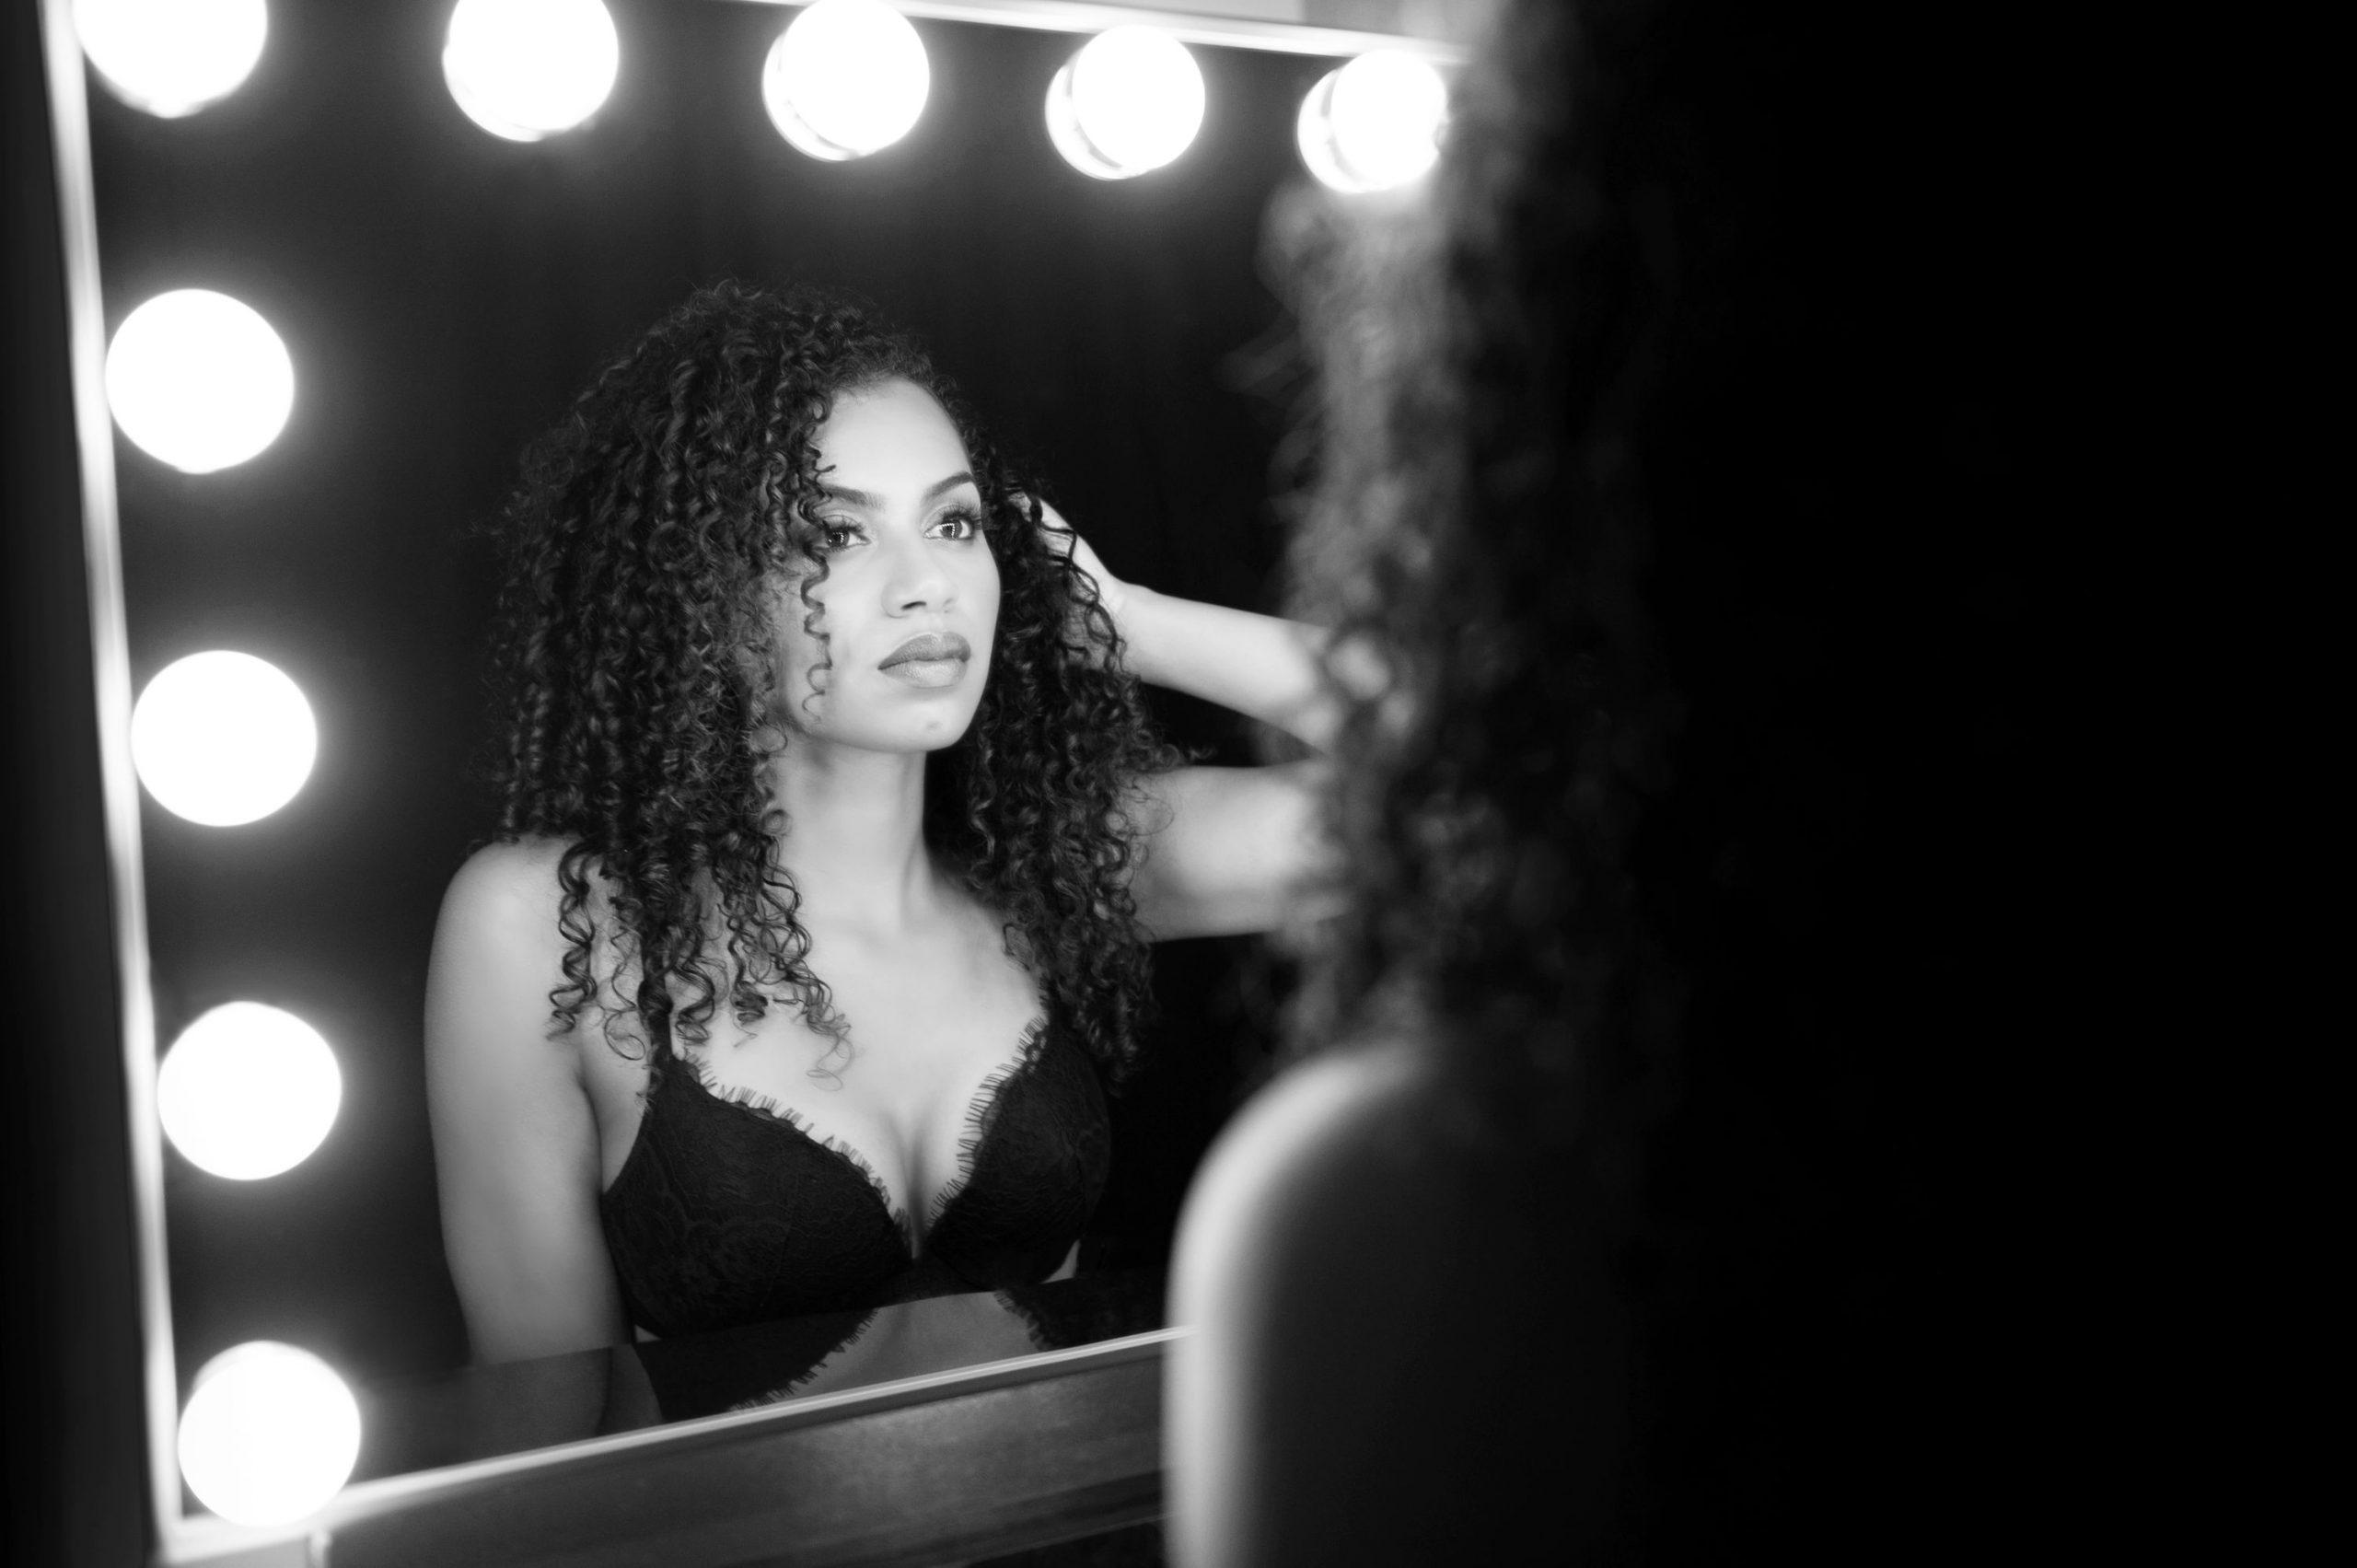 black and white boudoir photography sexy victoria secret lingerie